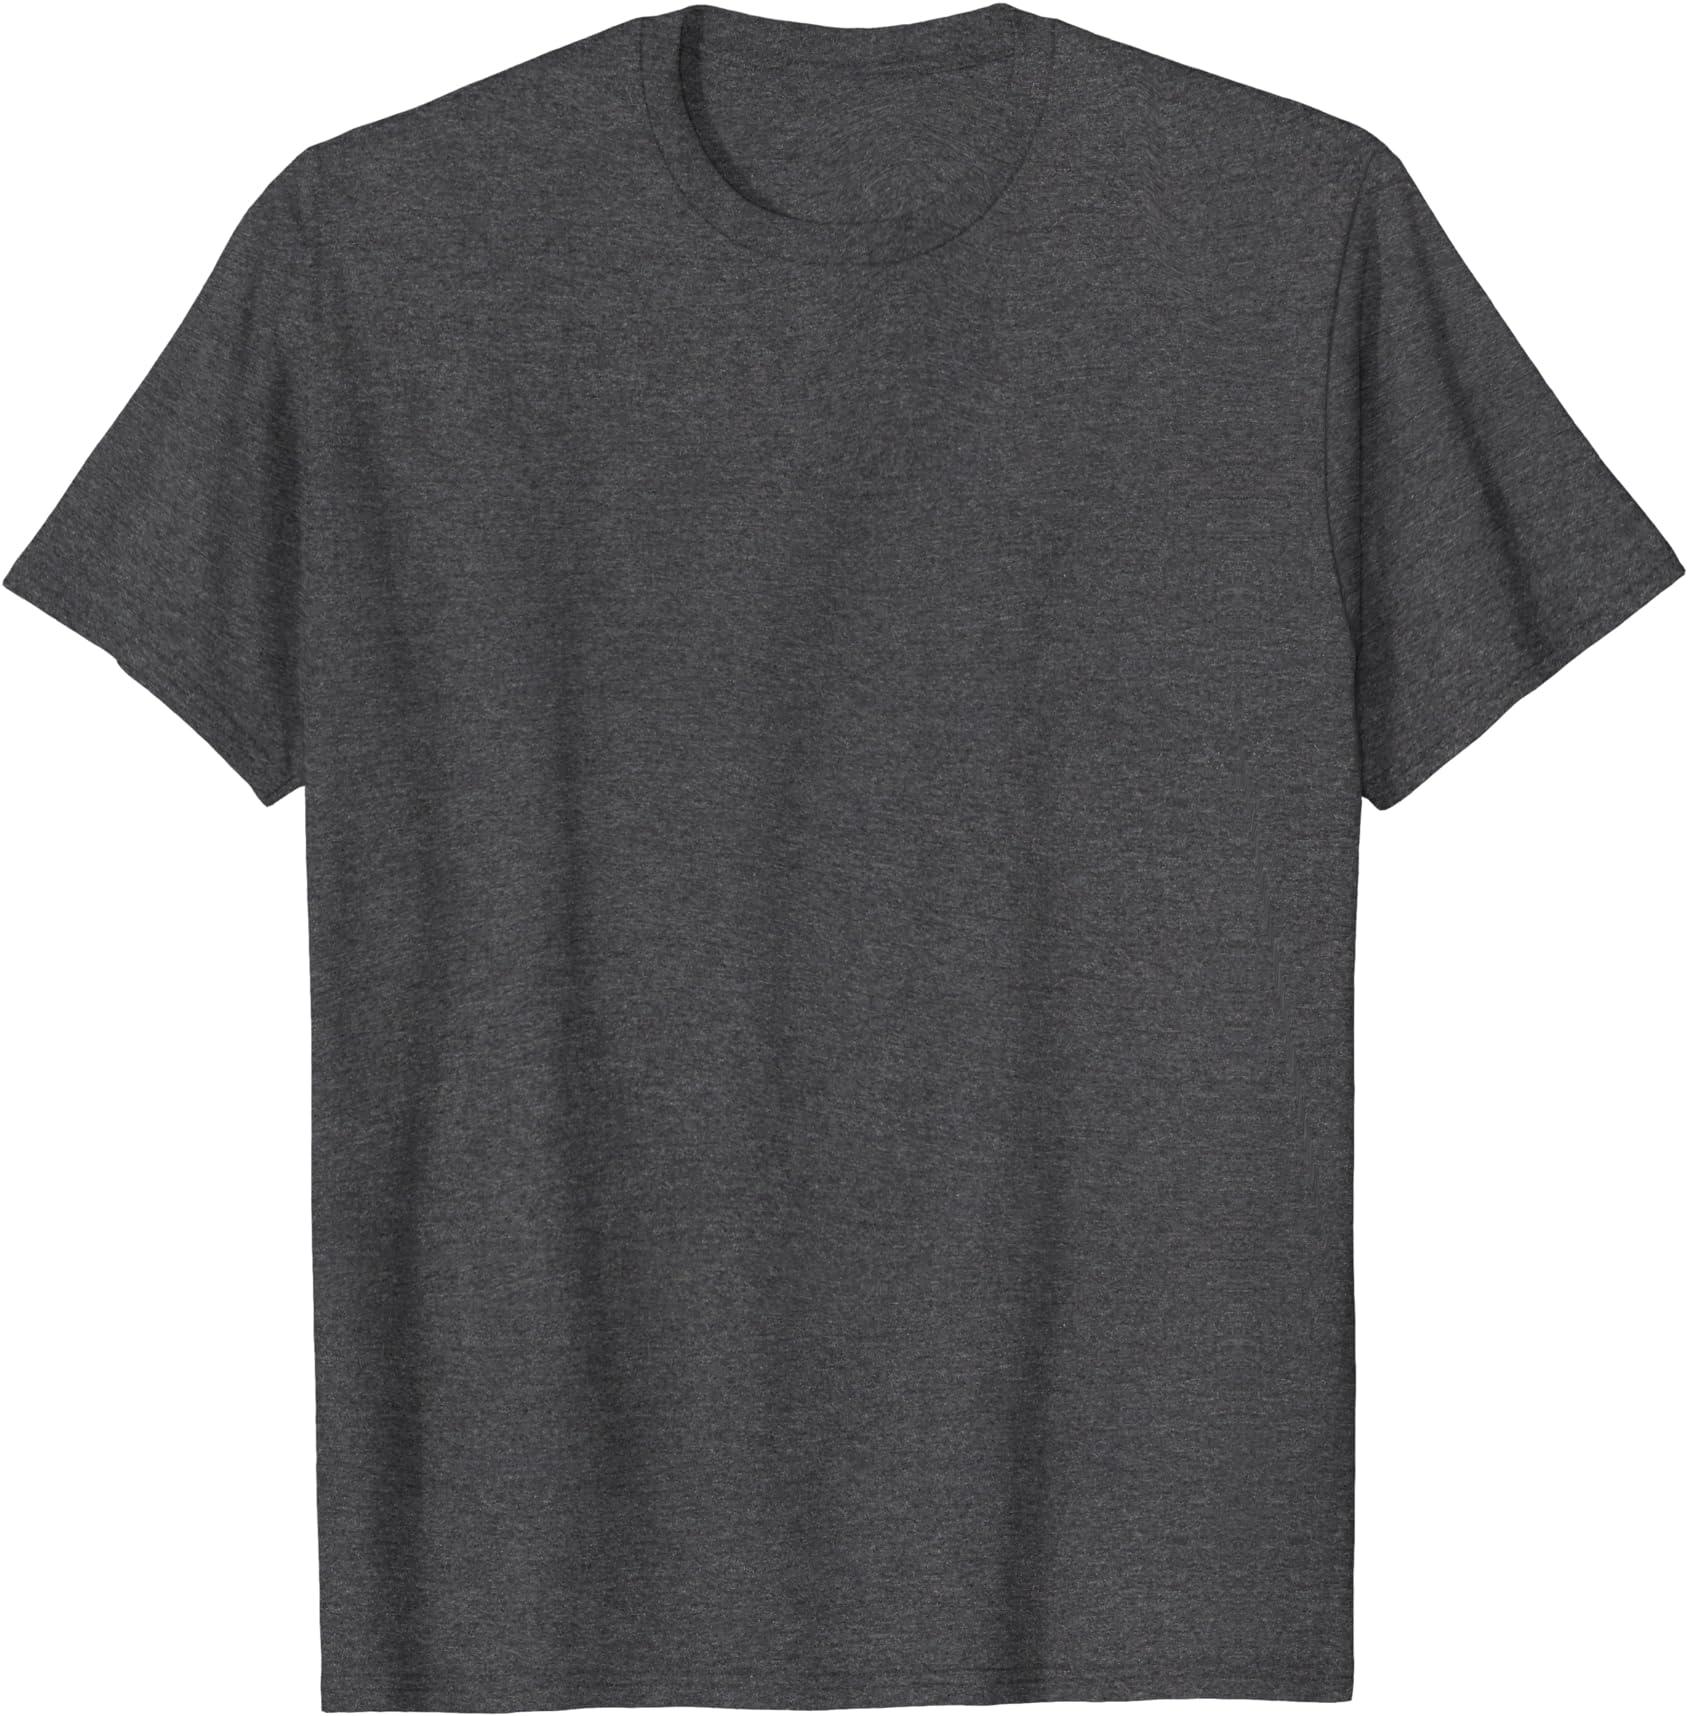 Make The Birds Champions Again Short-Sleeve T-Shirt